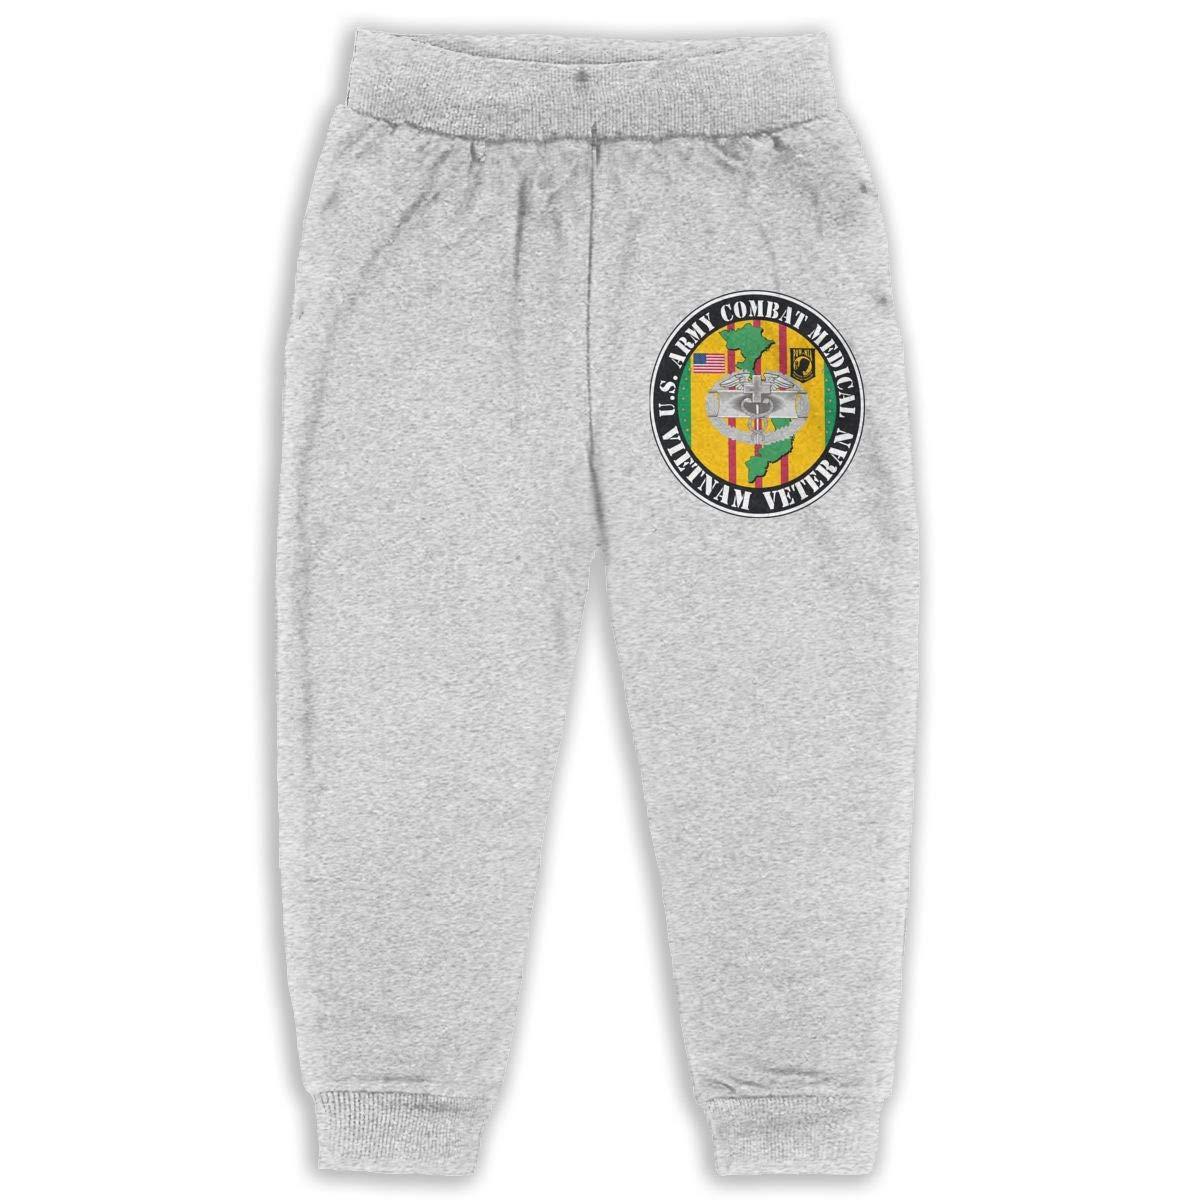 Army Combat Medical Vietnam Veteran Sweatpants for Boys /& Girls Fleece Active Joggers Elastic Pants DaXi1 U.S